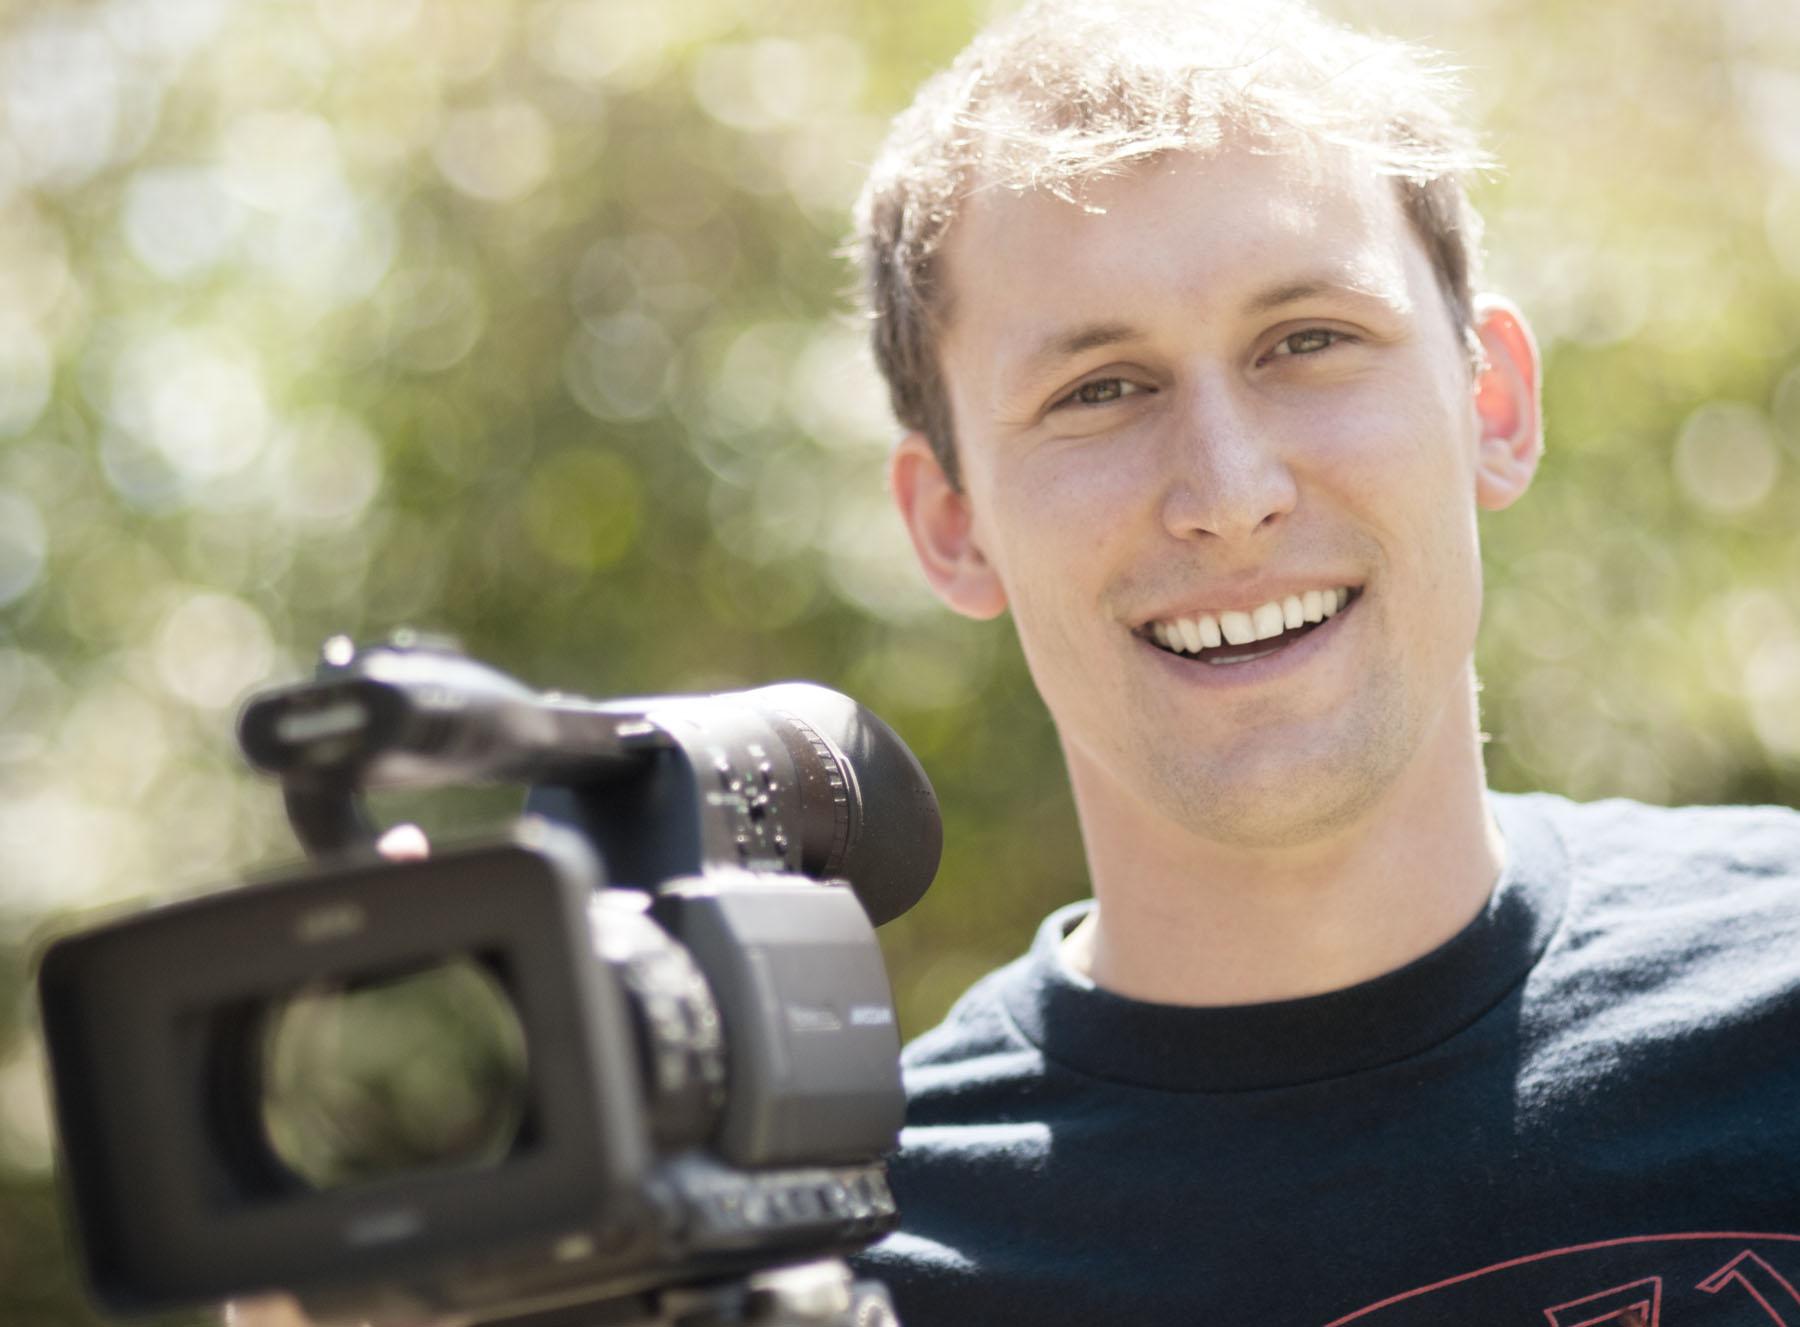 Msu Grad Student Working To Improve Children S Programming Wins Mr Rogers Scholarship